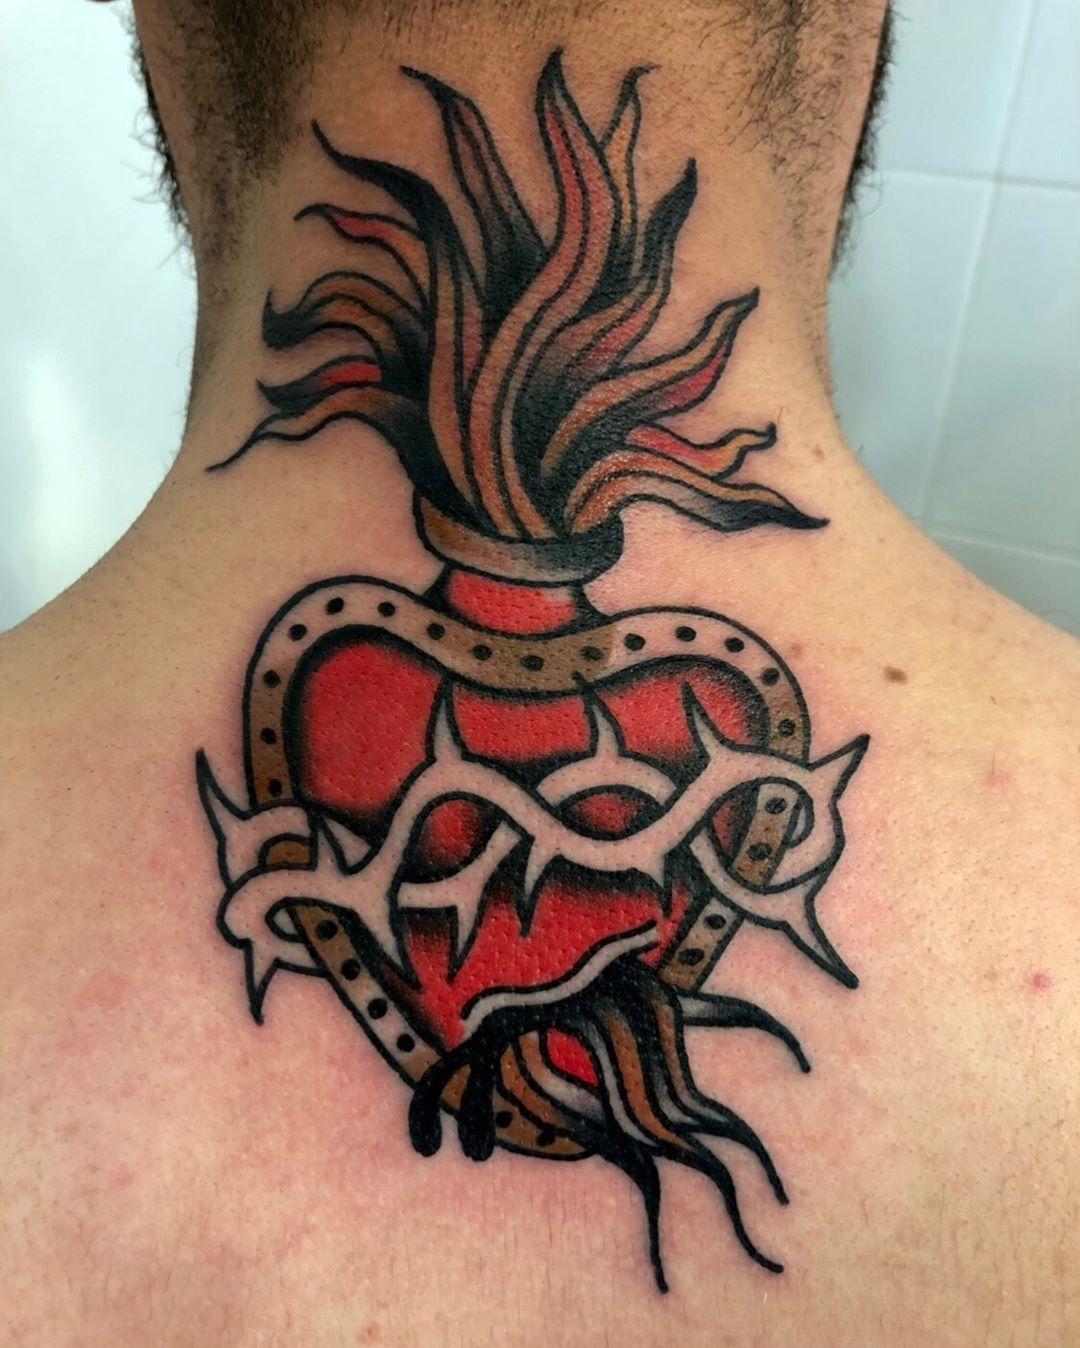 followforfollow,berlin,followmeciudadreal,ciudadreal,tomelloso,almagro,puertollano,tatuajesenpuertollano,tatuajesendaimiel,ciudadrealtattoo,ciudadrealtatuajes,tatuajesciudadreal,follow,ciudadrealtatuajes,puertollano,ciudadreal,tattoos,ciudadrealtattoo,tattooers,besttattooers,juantabasco,ciudadrealsetatua,ink,tatuajes,realismo,realistictattoo,ciudadrealtattoo,tatuajesenpuertollano,traditionaltattoos,castillalamancha,ink,tattooart,zurichtattoo,daimiel